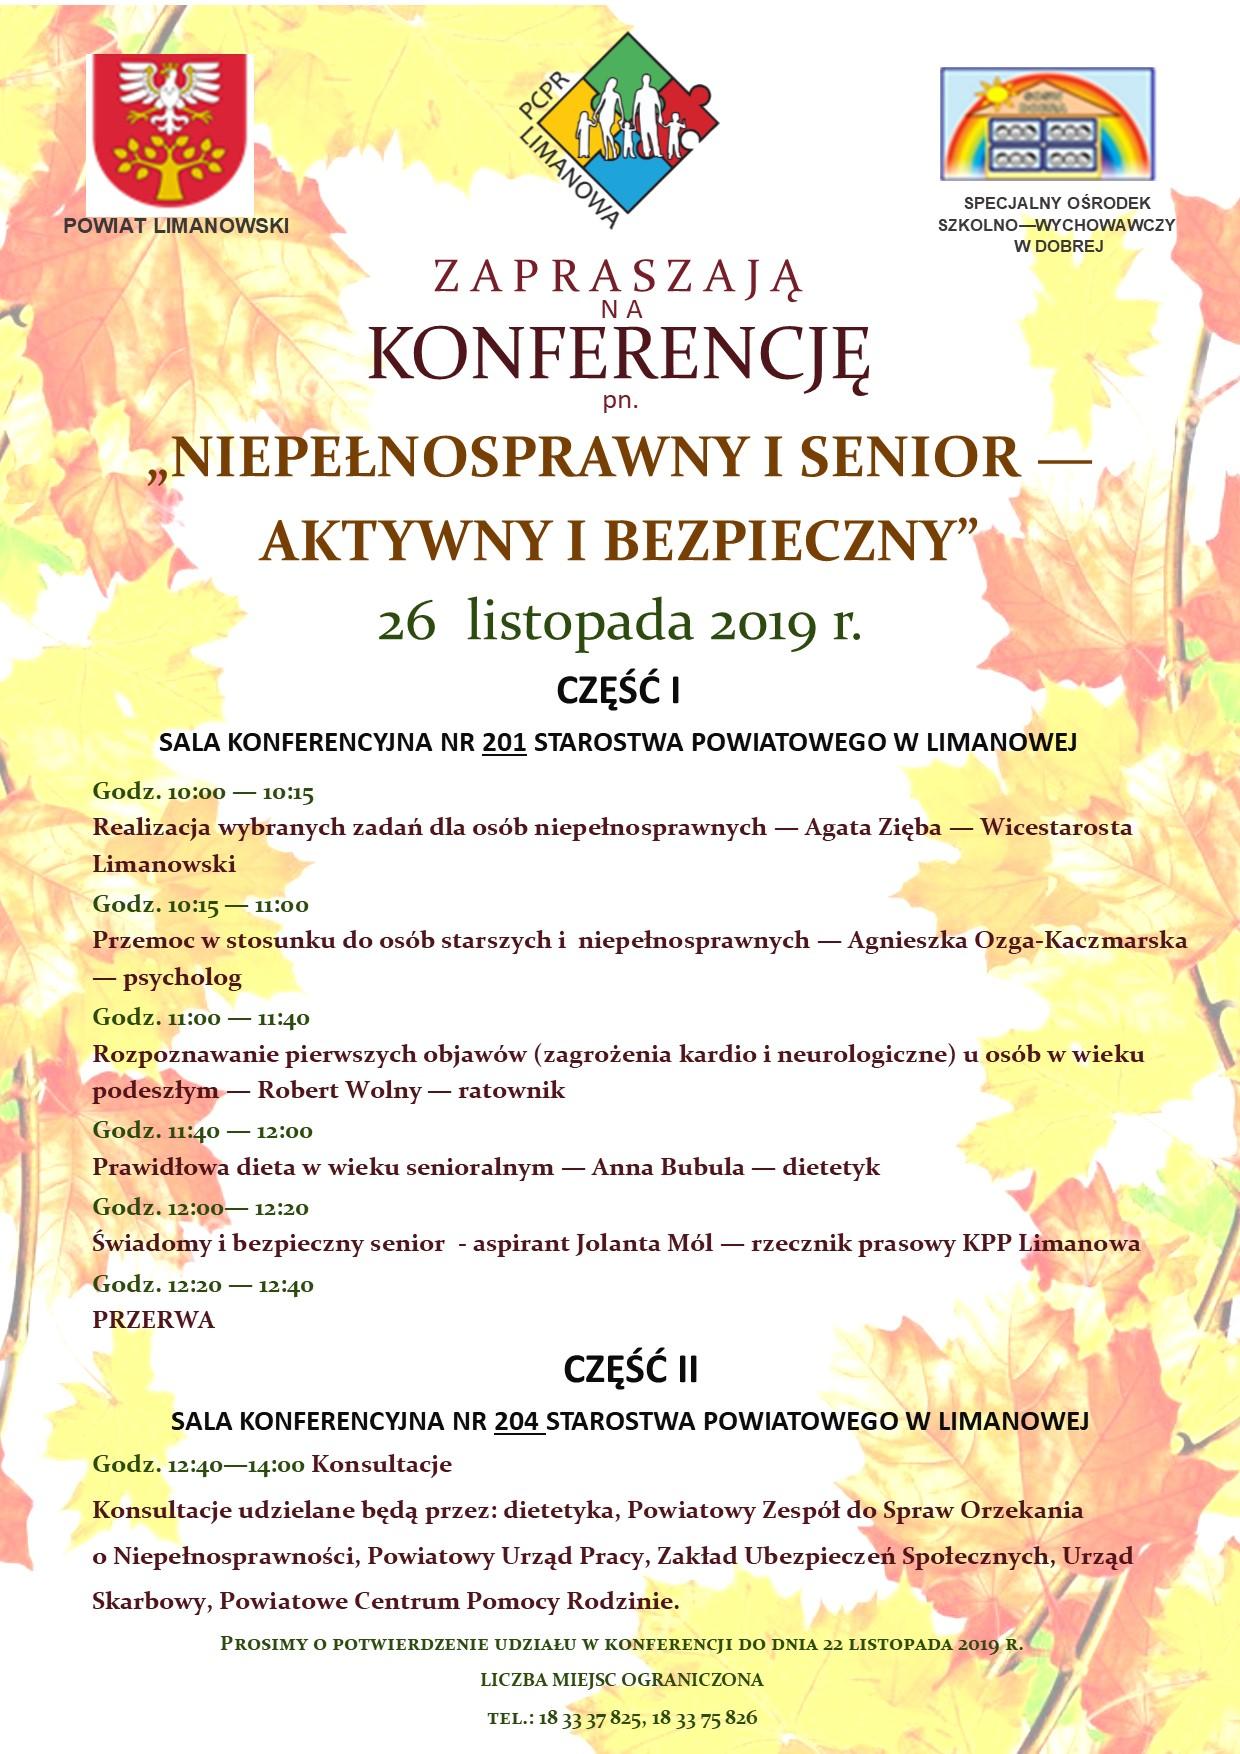 PCPR konferencja info.